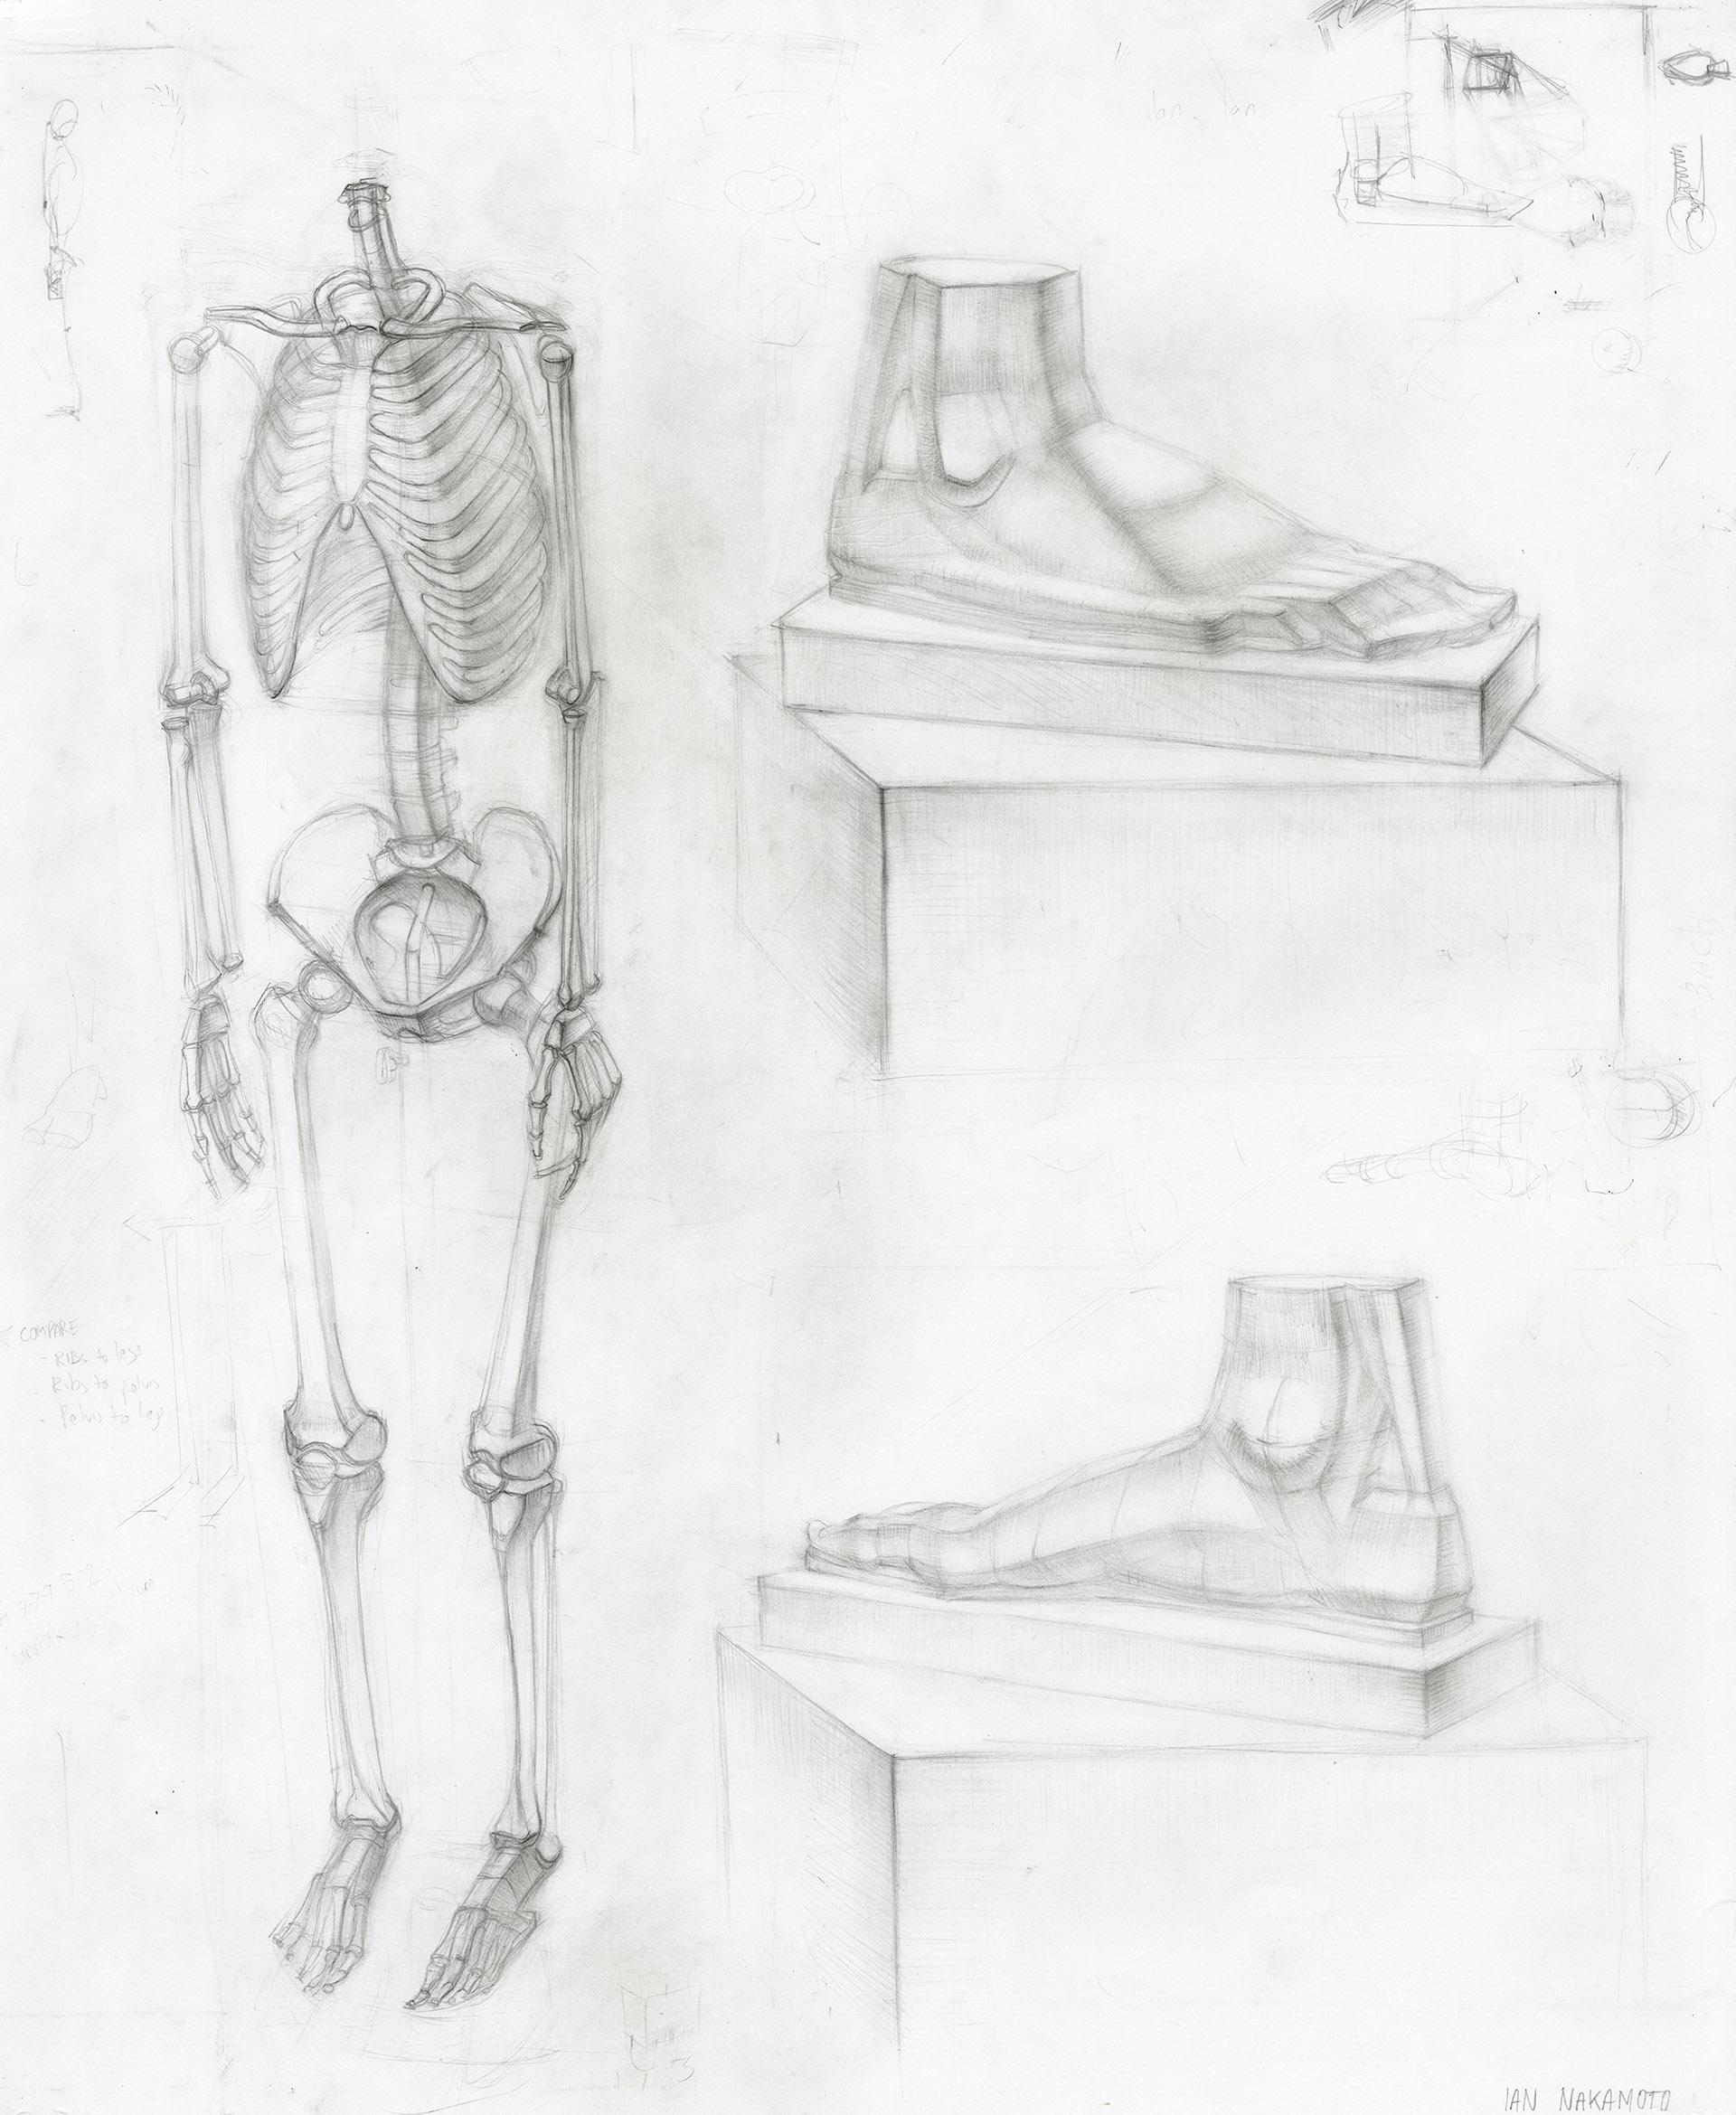 Ian-Nakamoto-Planar-Drawing-Academic-Study-Skeleton-Feet-Cast-1920